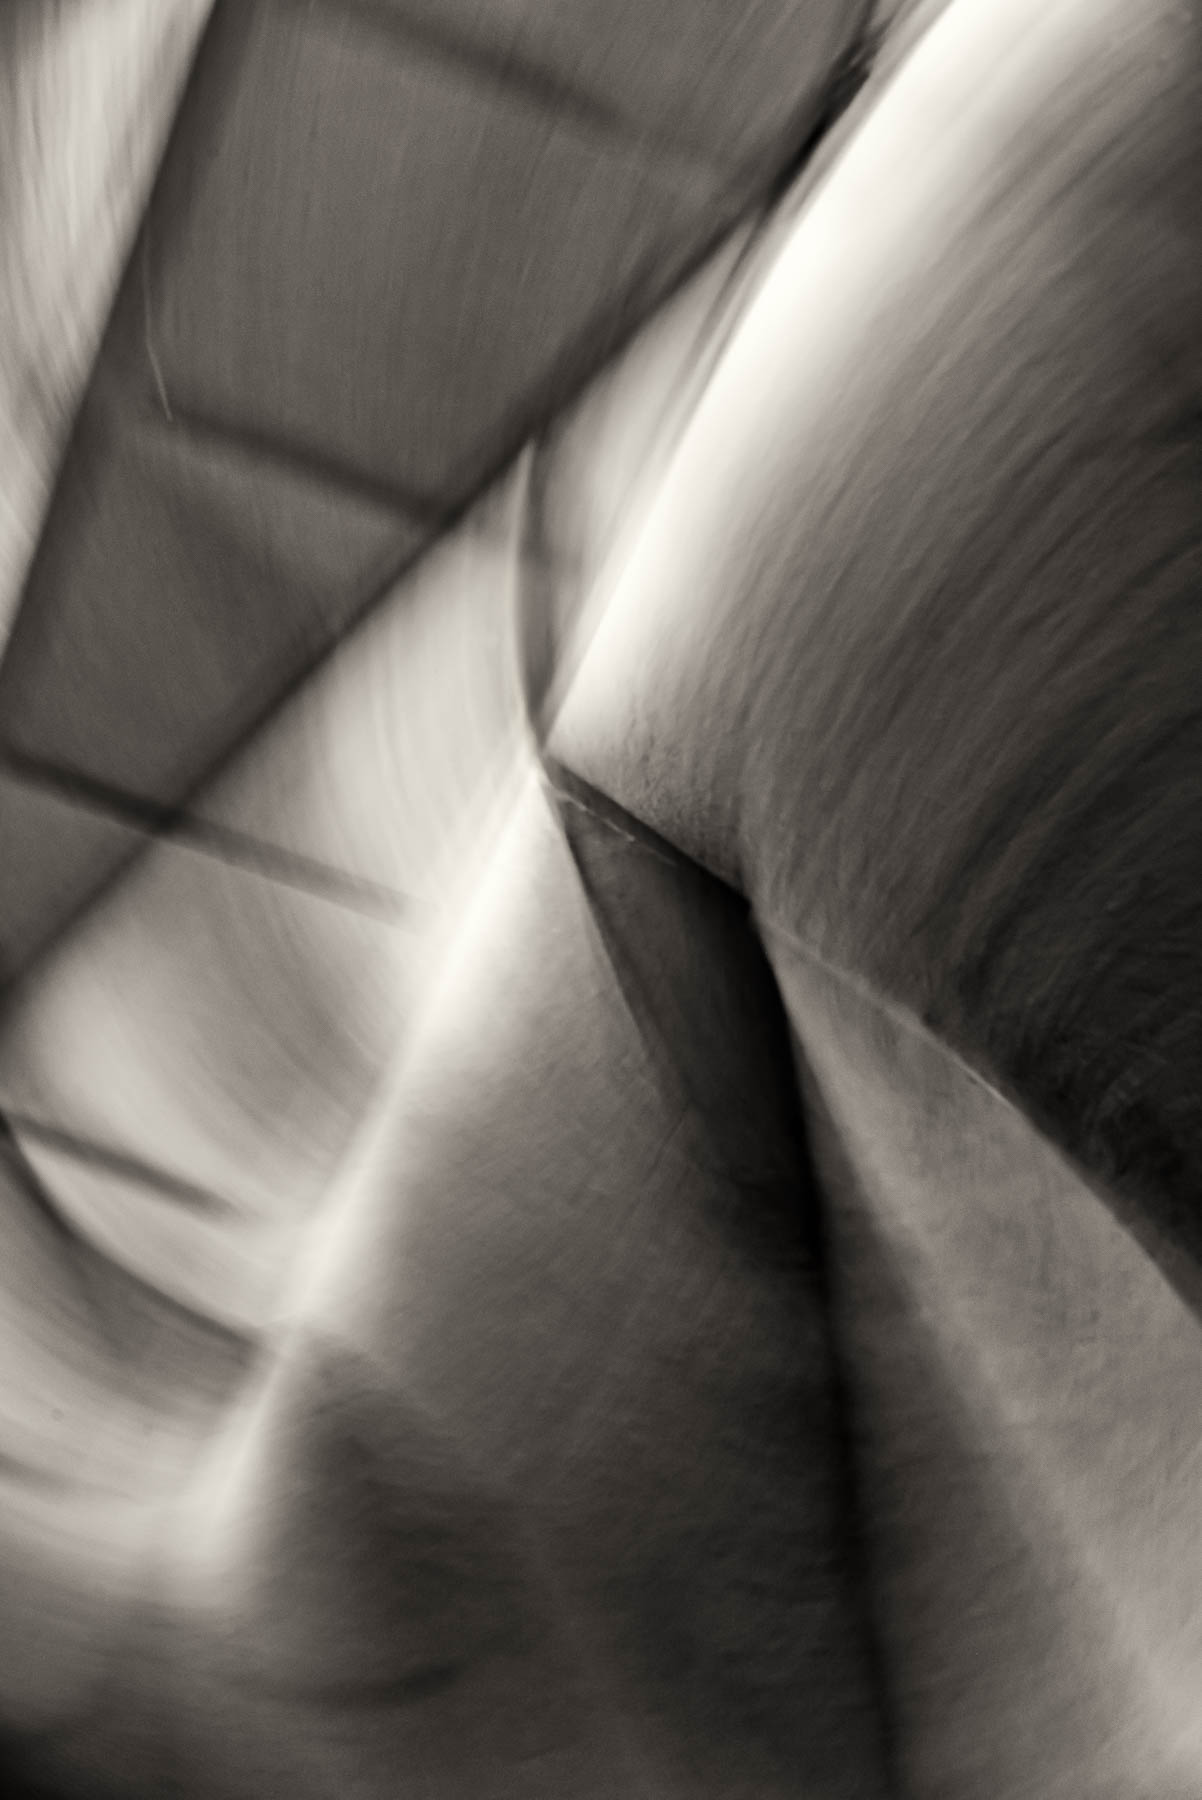 DUTCH_Bagley_Line Waves_Line Up 3_1.jpg